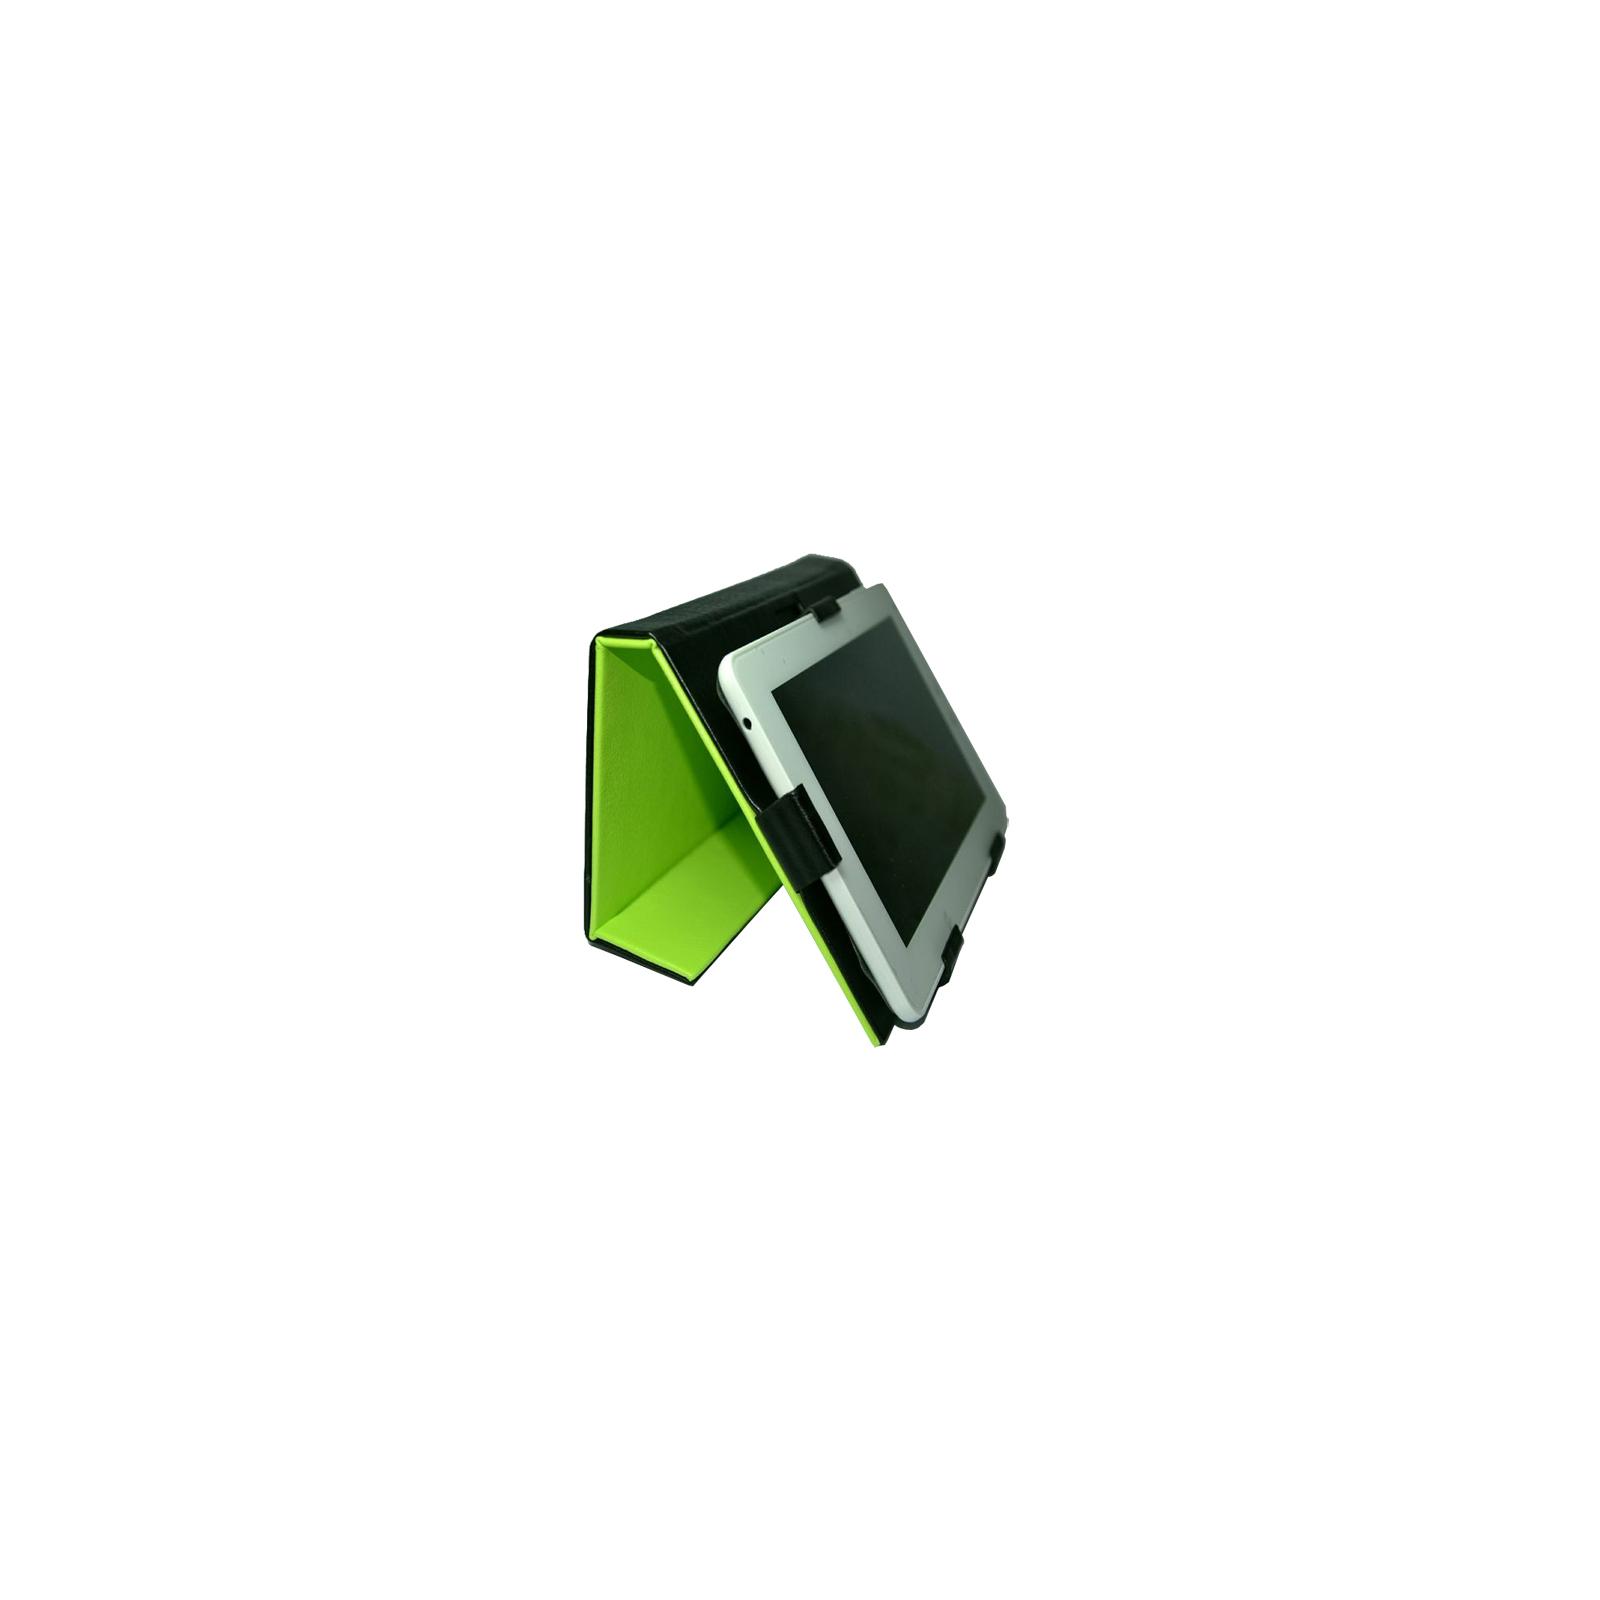 Чехол для планшета Vento 8 Desire Bright - lime изображение 3